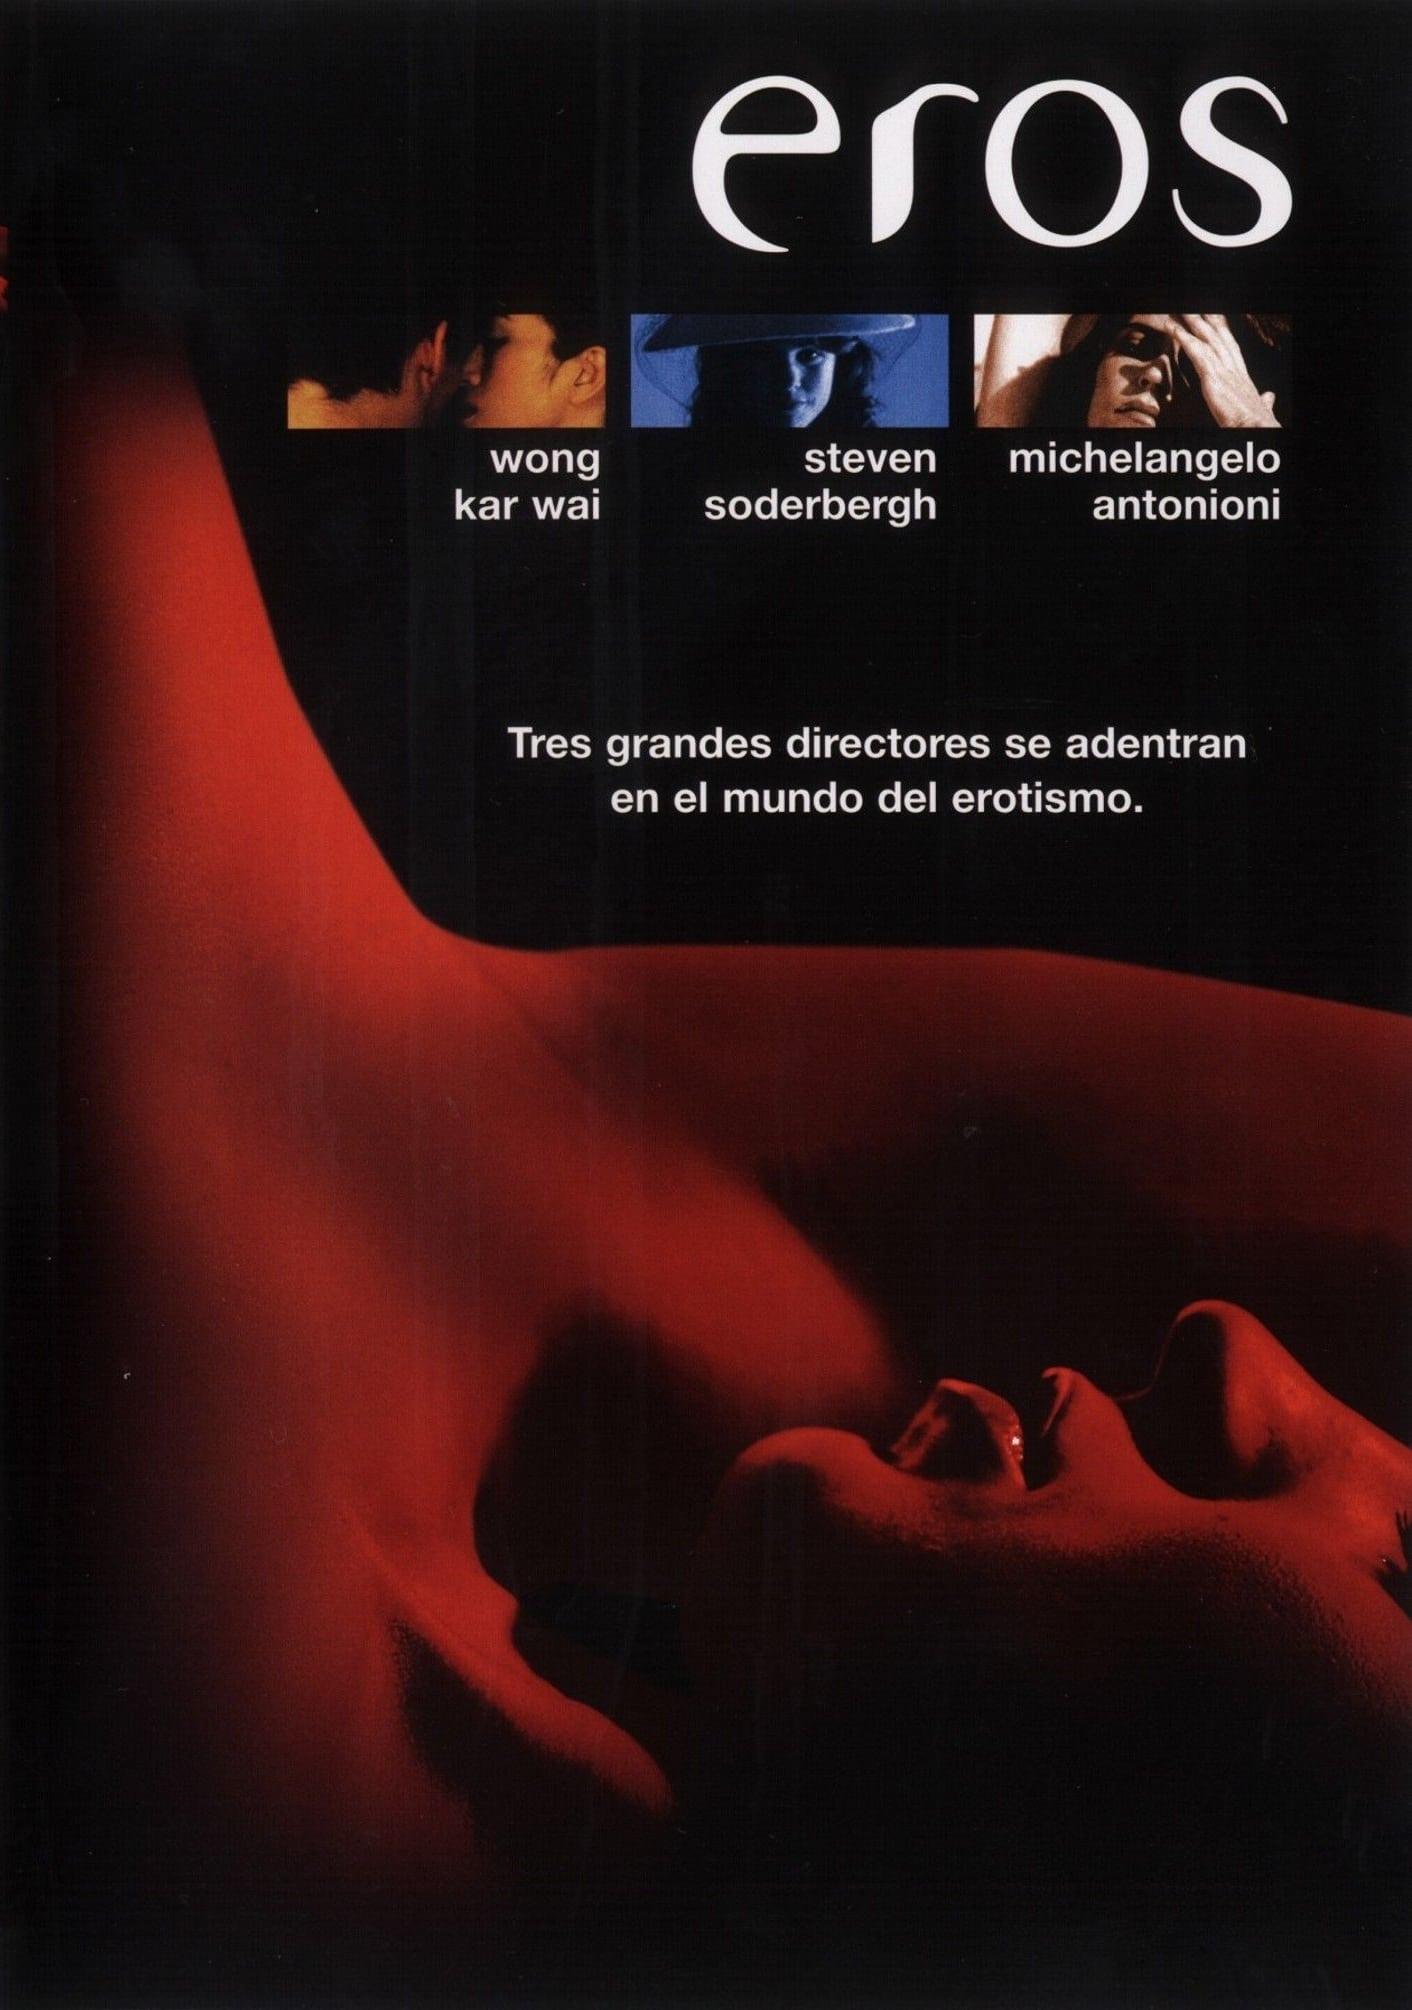 kinostudiya-eros-film-filmi-porno-videoroliki-pizda-i-huy-krupnim-planom